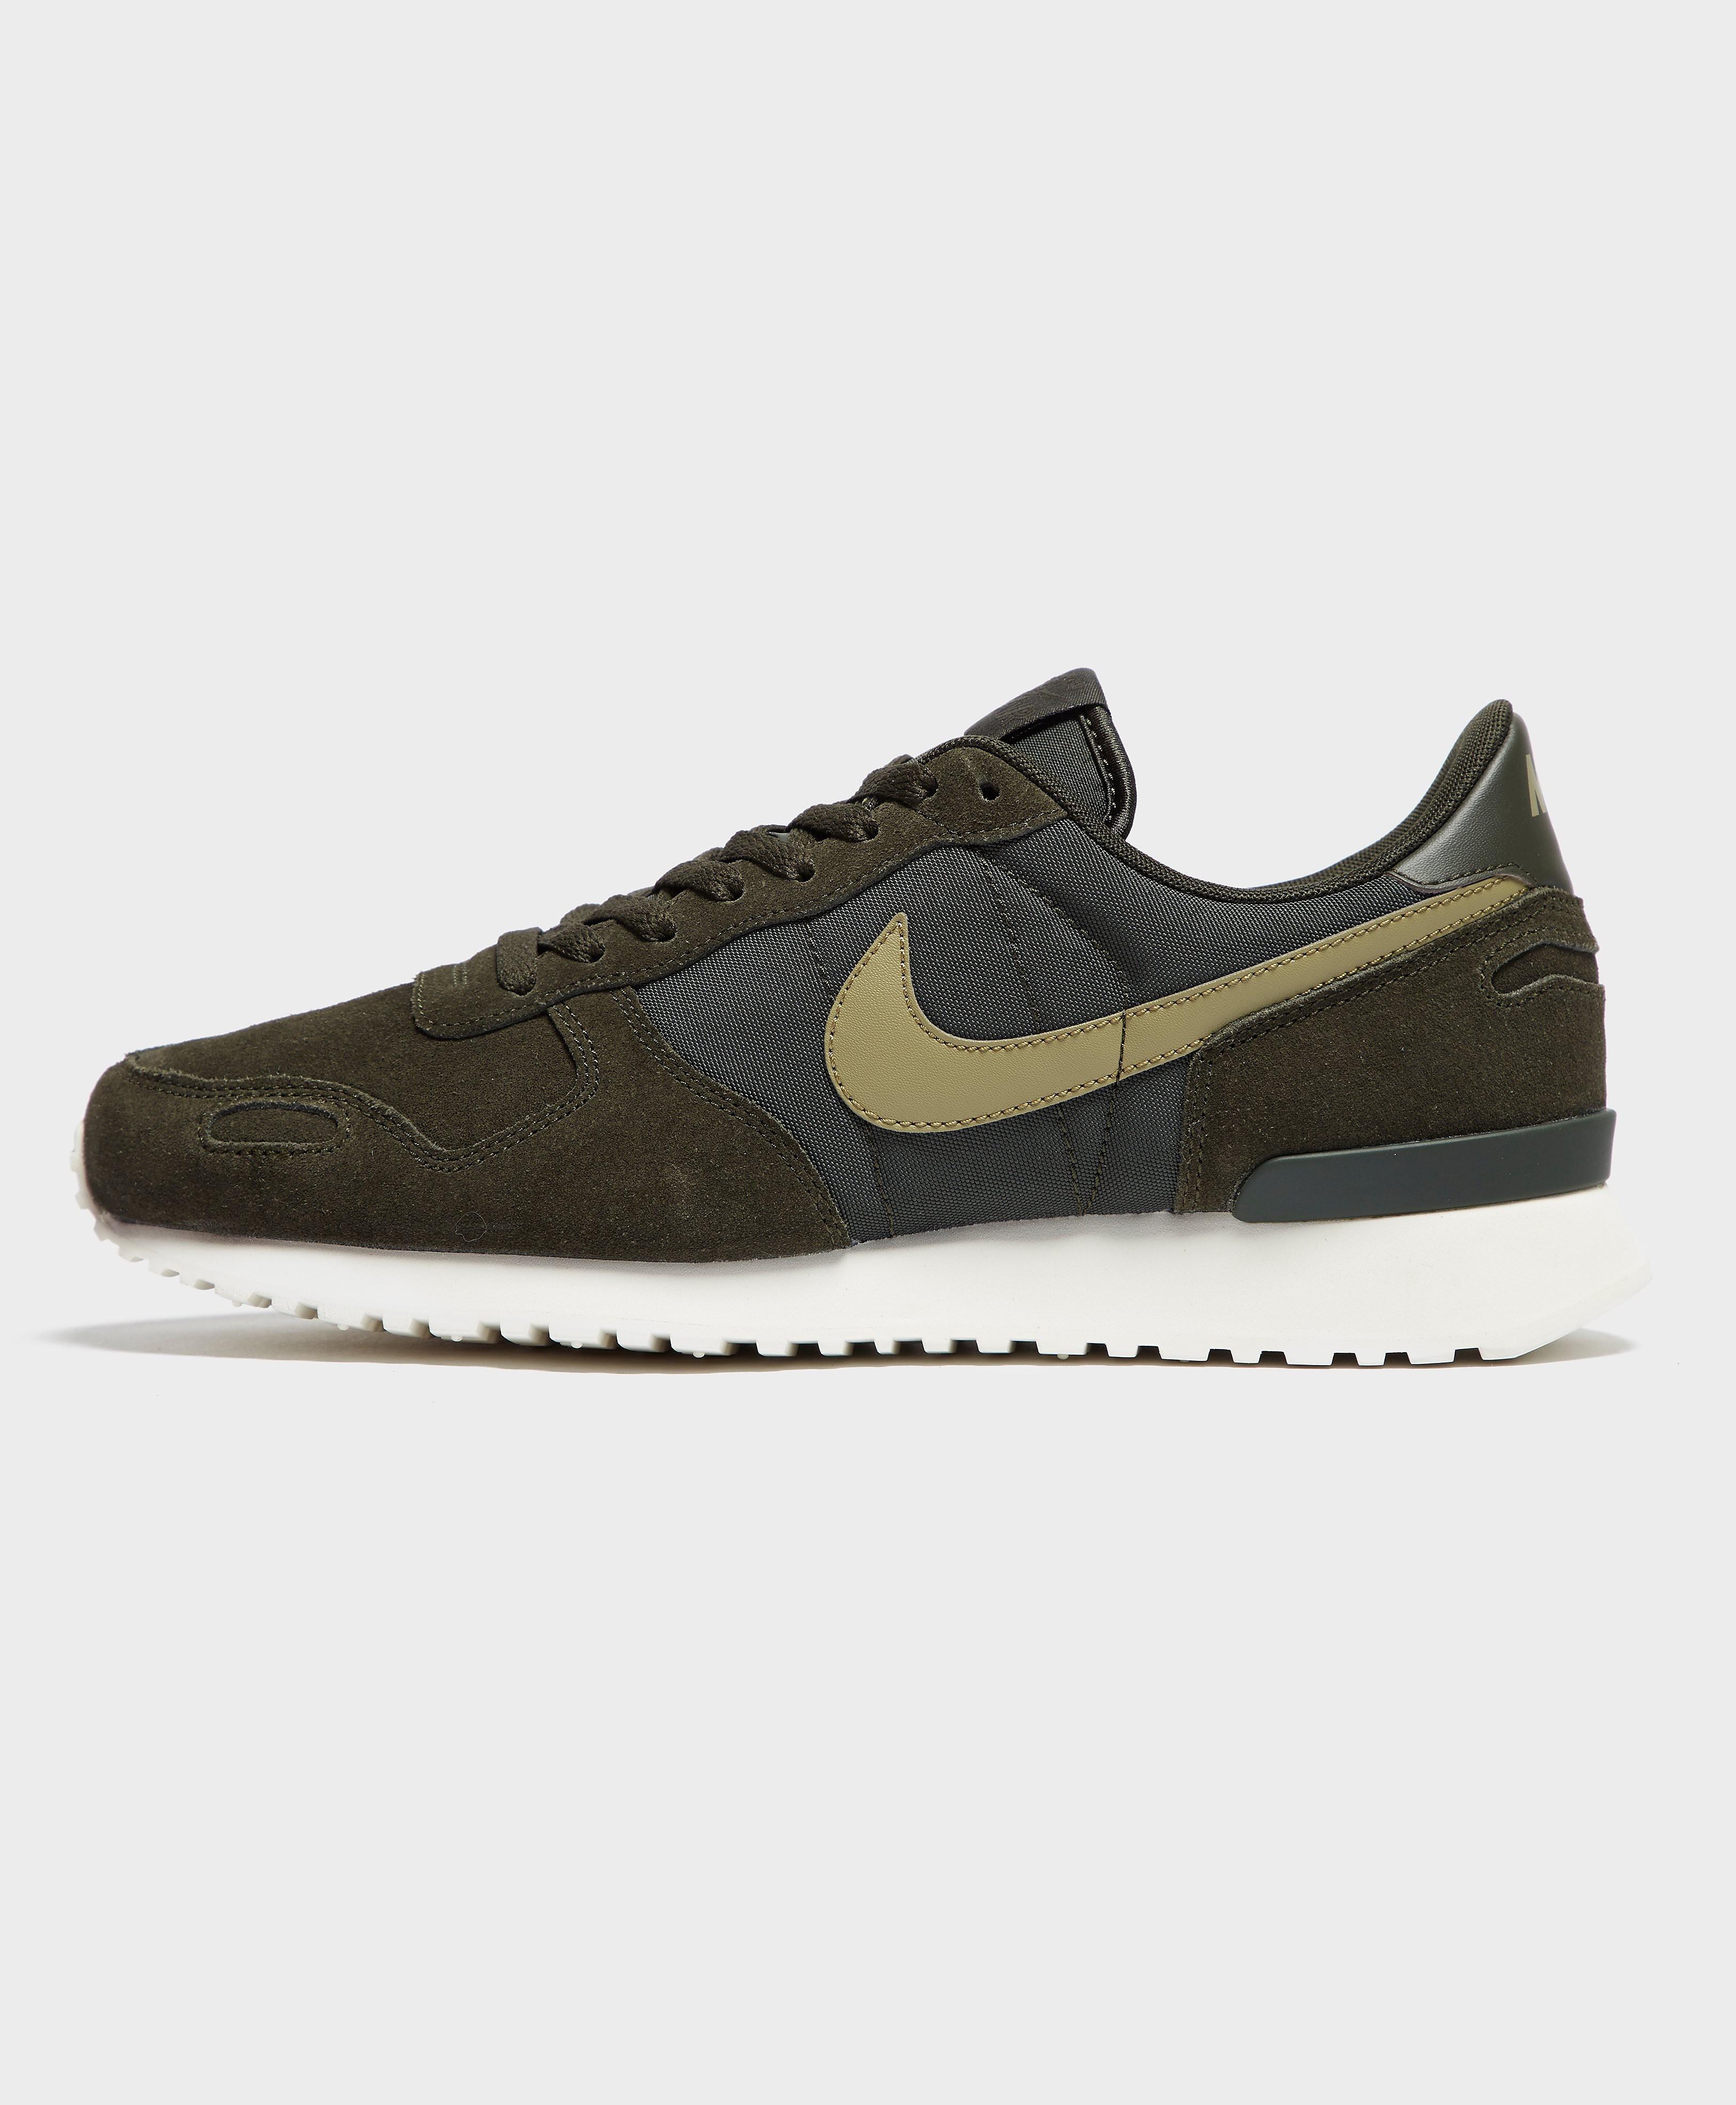 Nike Vortex LTR